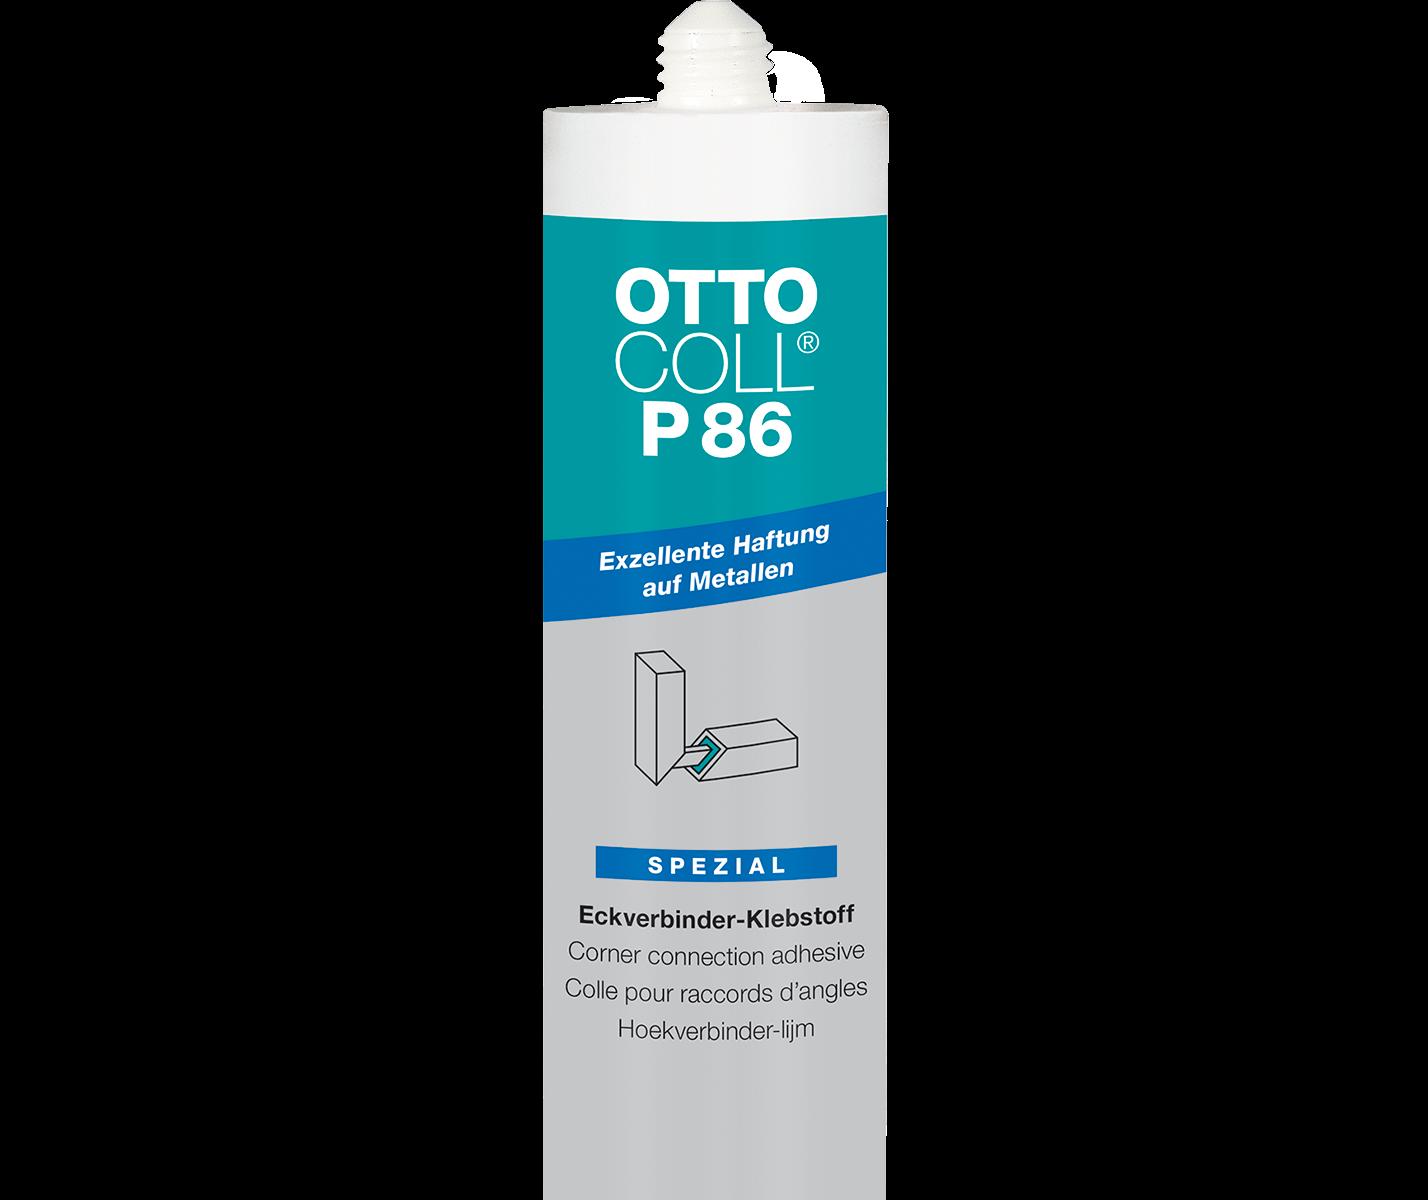 Ottocoll P 86